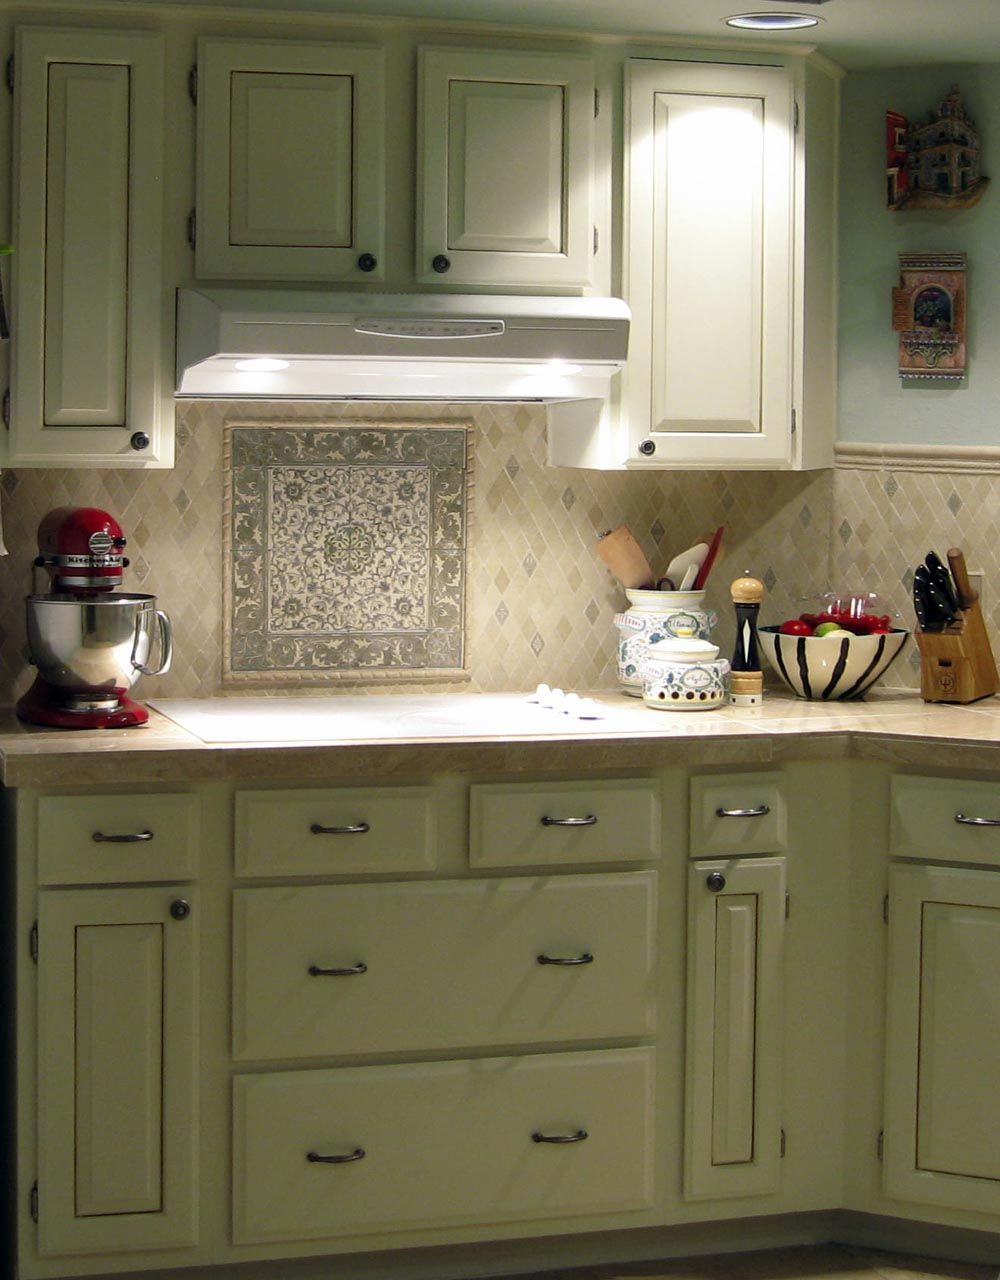 Kitchen Tile Backsplash Murals 42 Best Ideas About Kitchen Assessories On Pinterest Backsplash